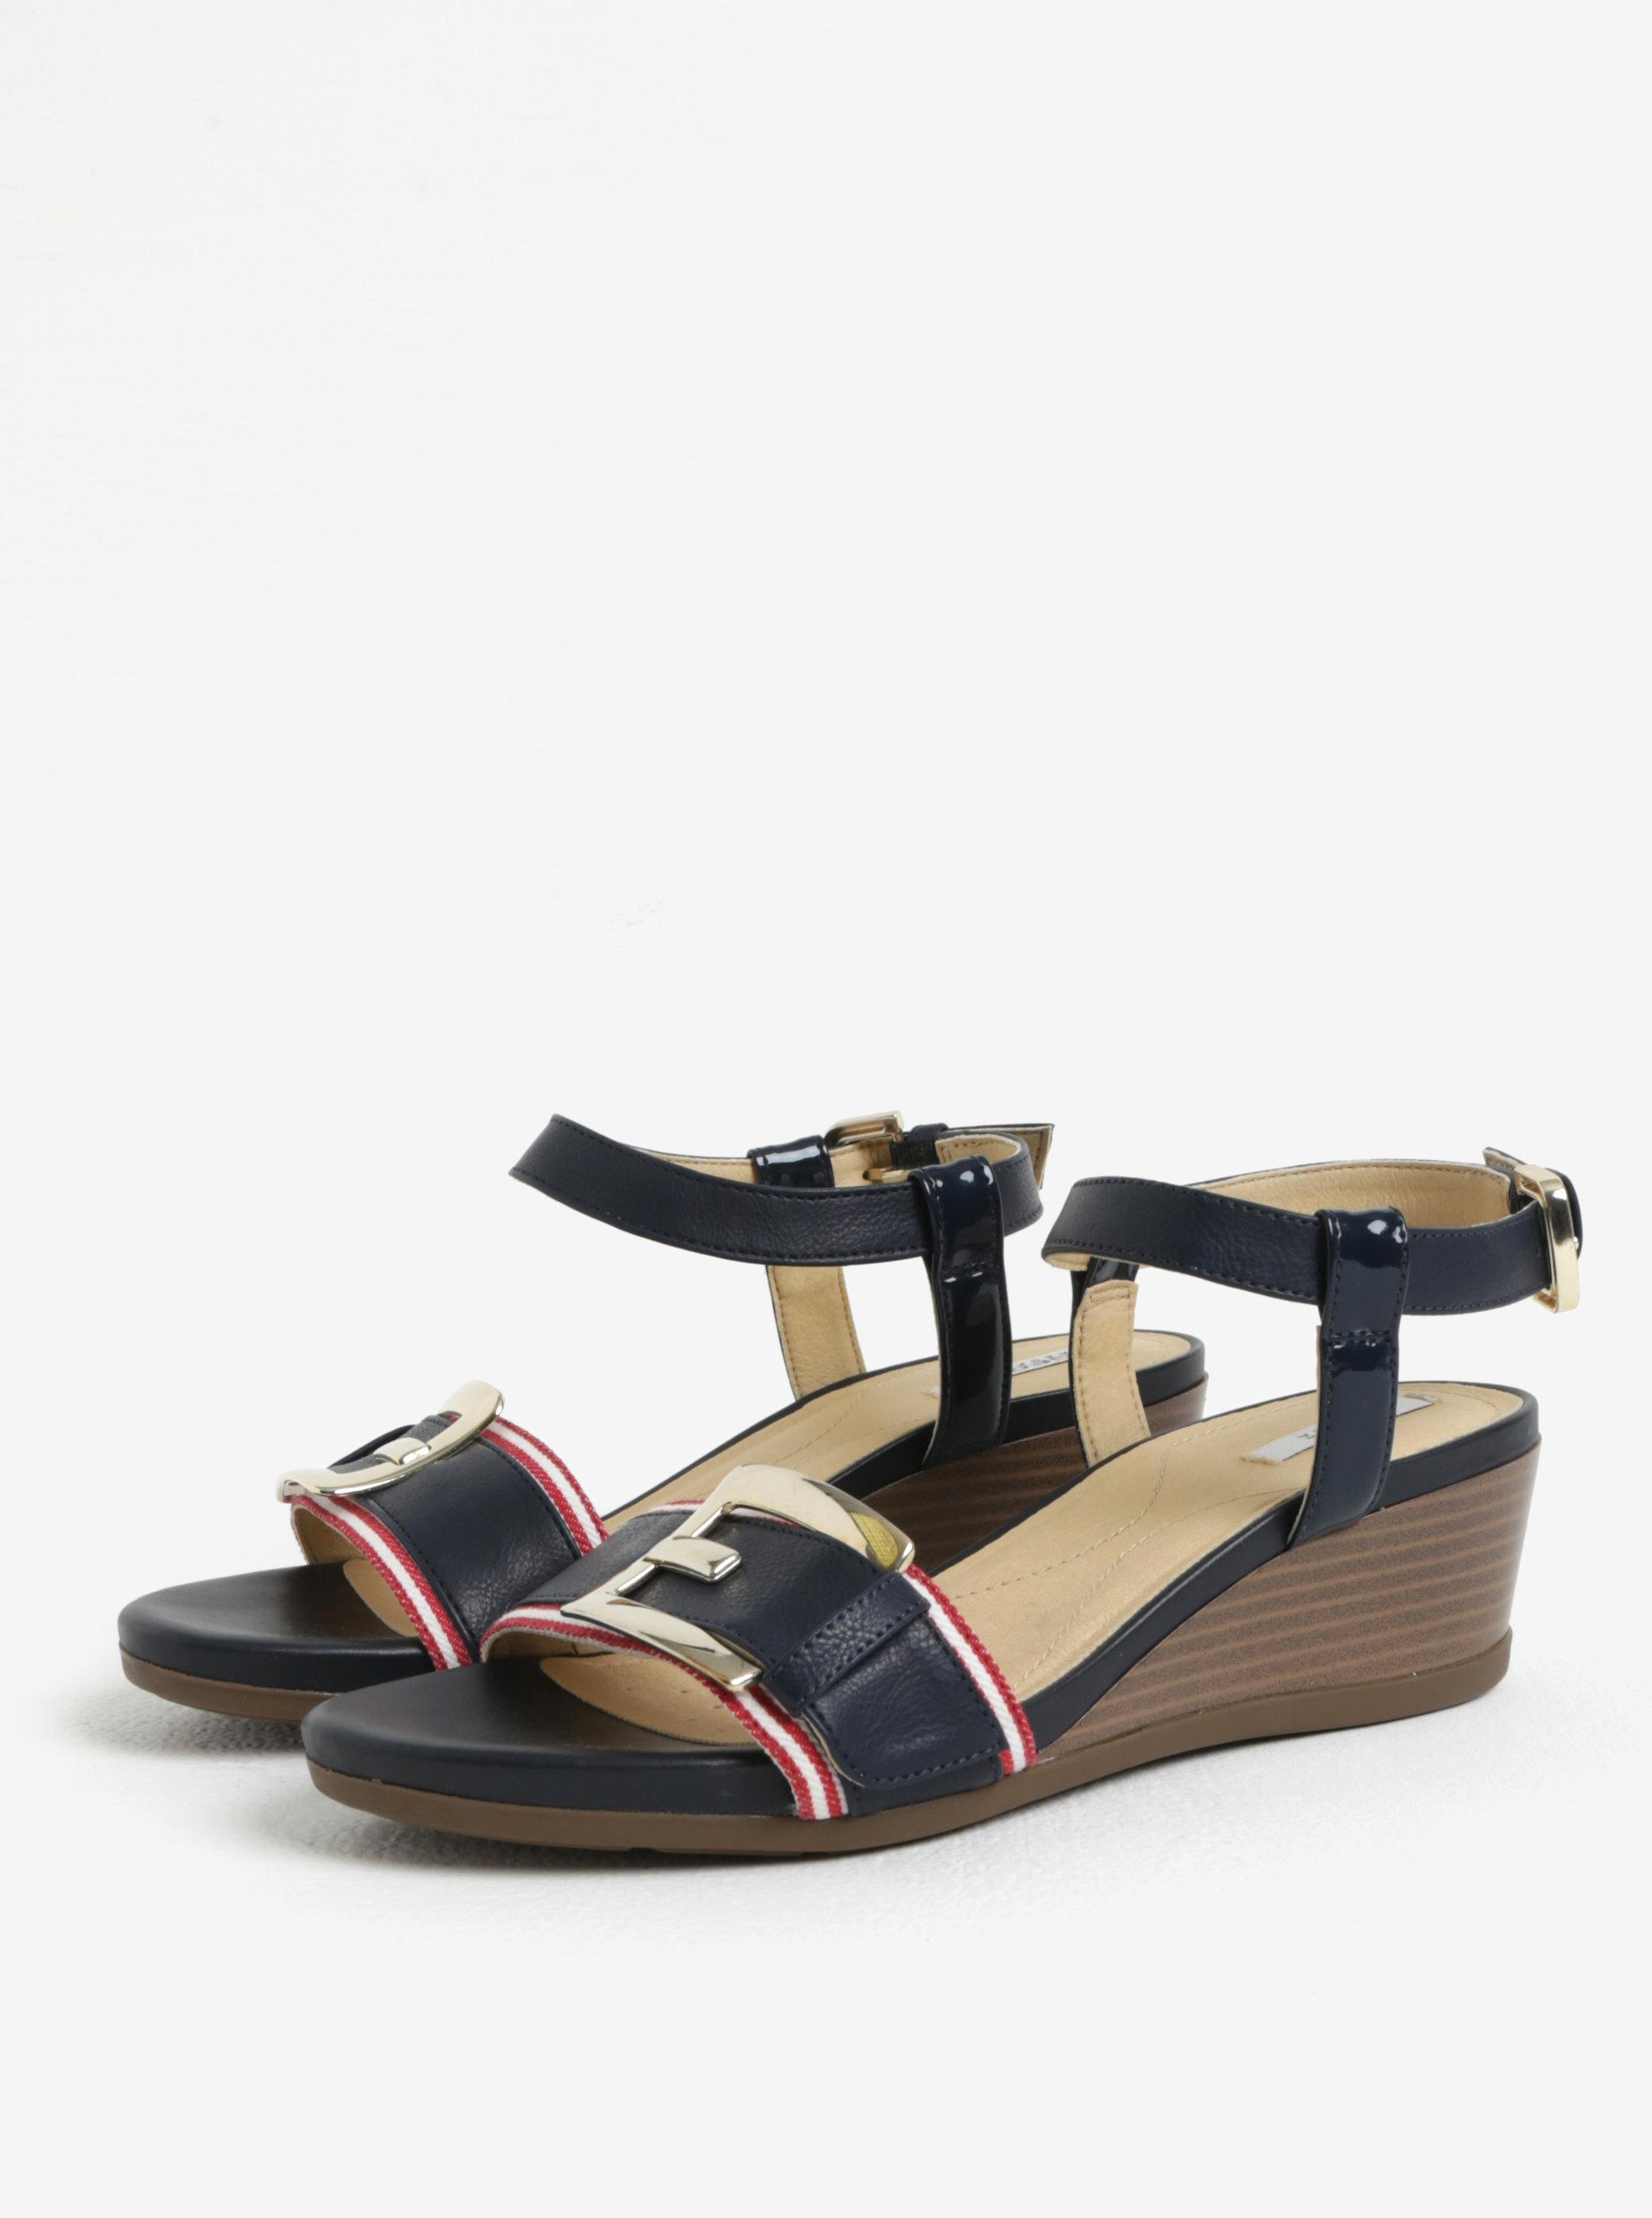 28197432a Modré sandále na plnom podpätku Geox Mary Karmen   ZOOT.sk